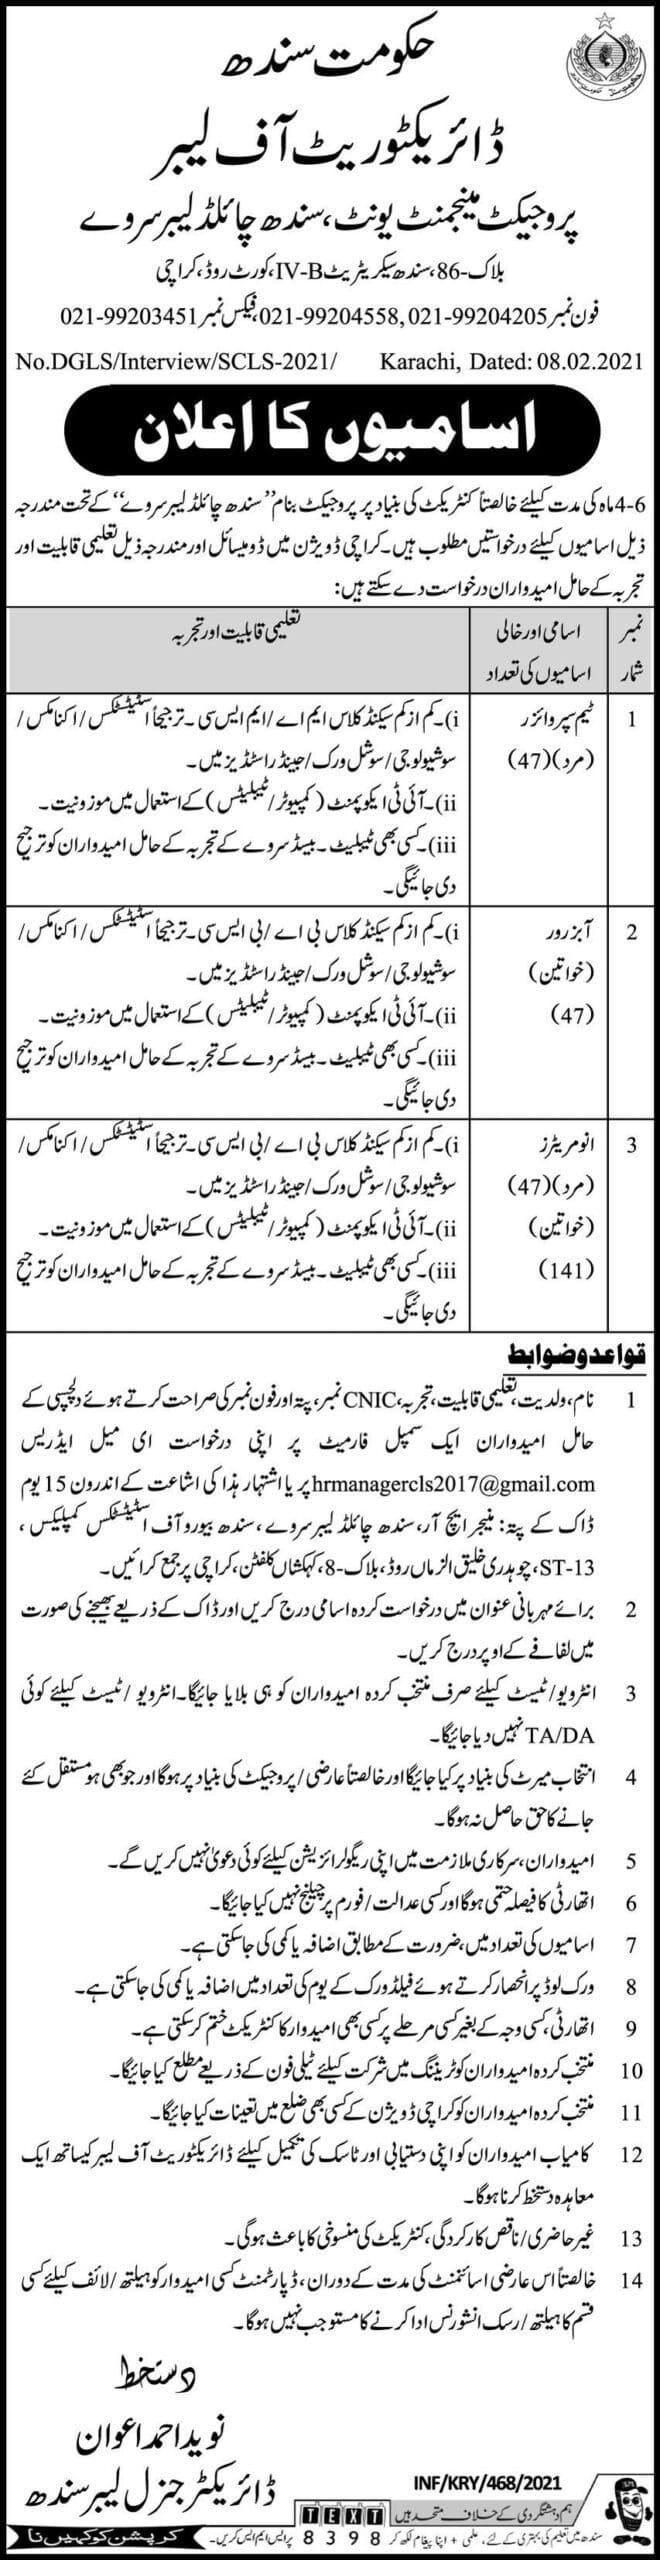 Labour Department Sindh Jobs 2021 - Download Application Form